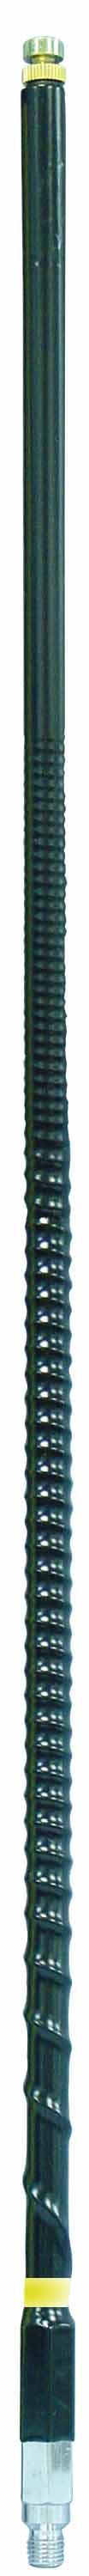 FG4-B - Firestik 4' NGP Replacement Whip Antenna- Black